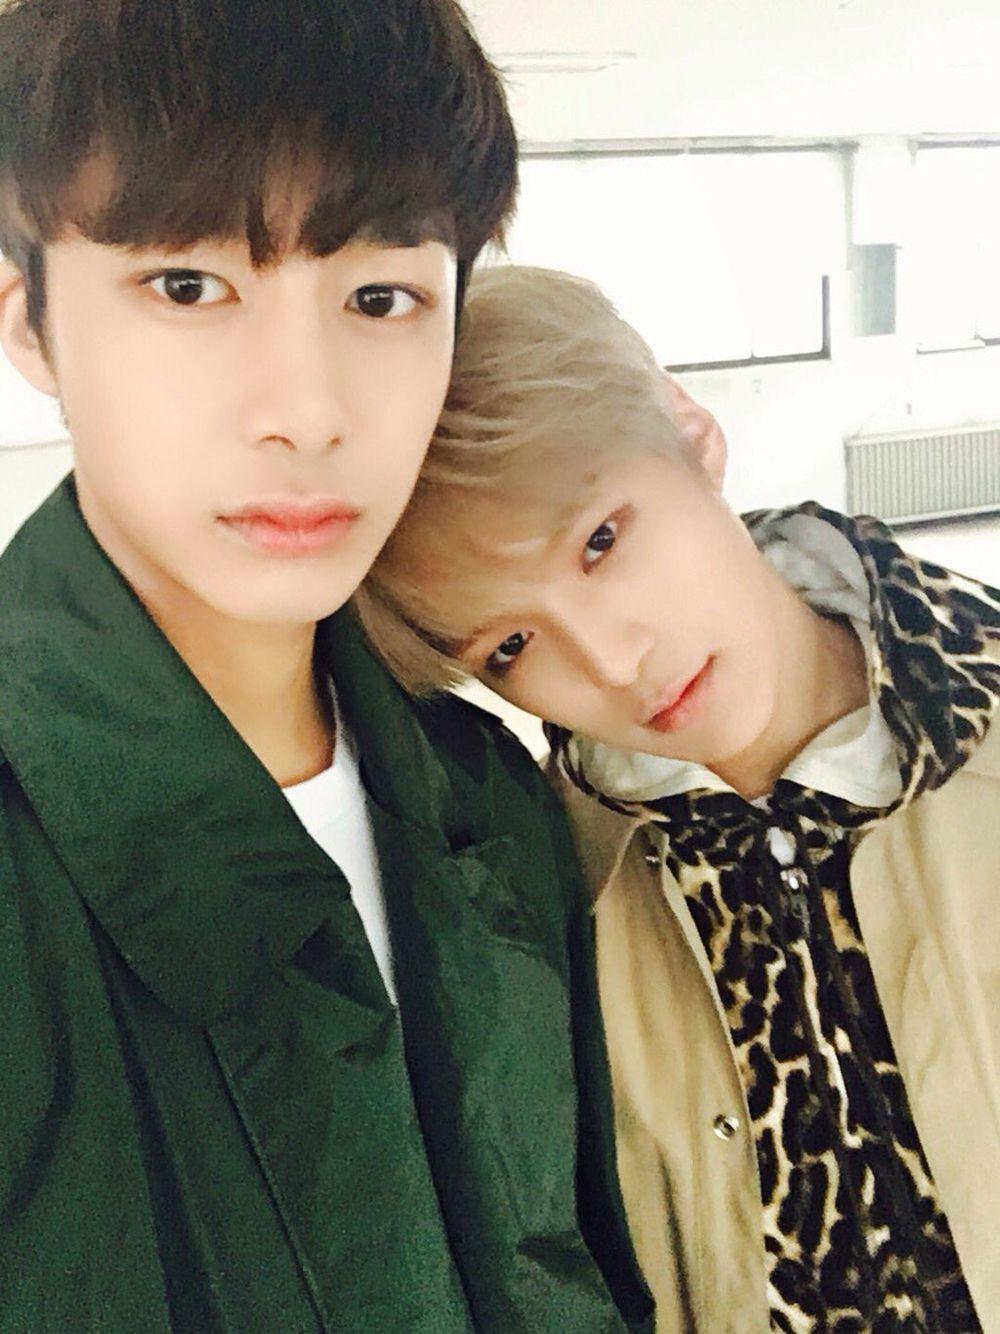 Monsta X // Hyungwon and Minhyuk